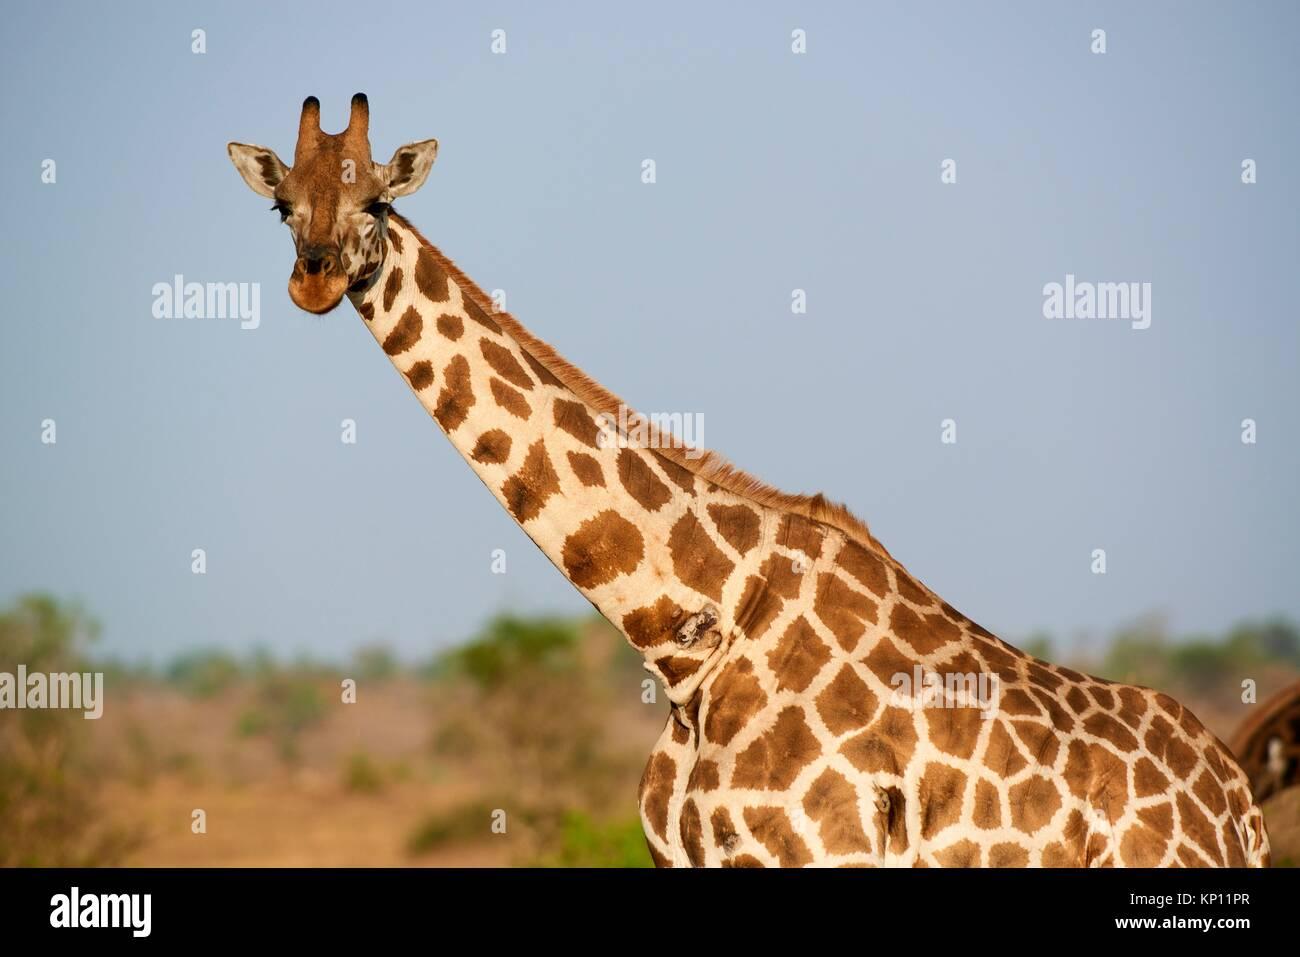 Rothschild Girafe (Giraffa camelopardalis rothschildi) portrait de Murchisson Falls National Park, de l'Ouganda. Photo Stock